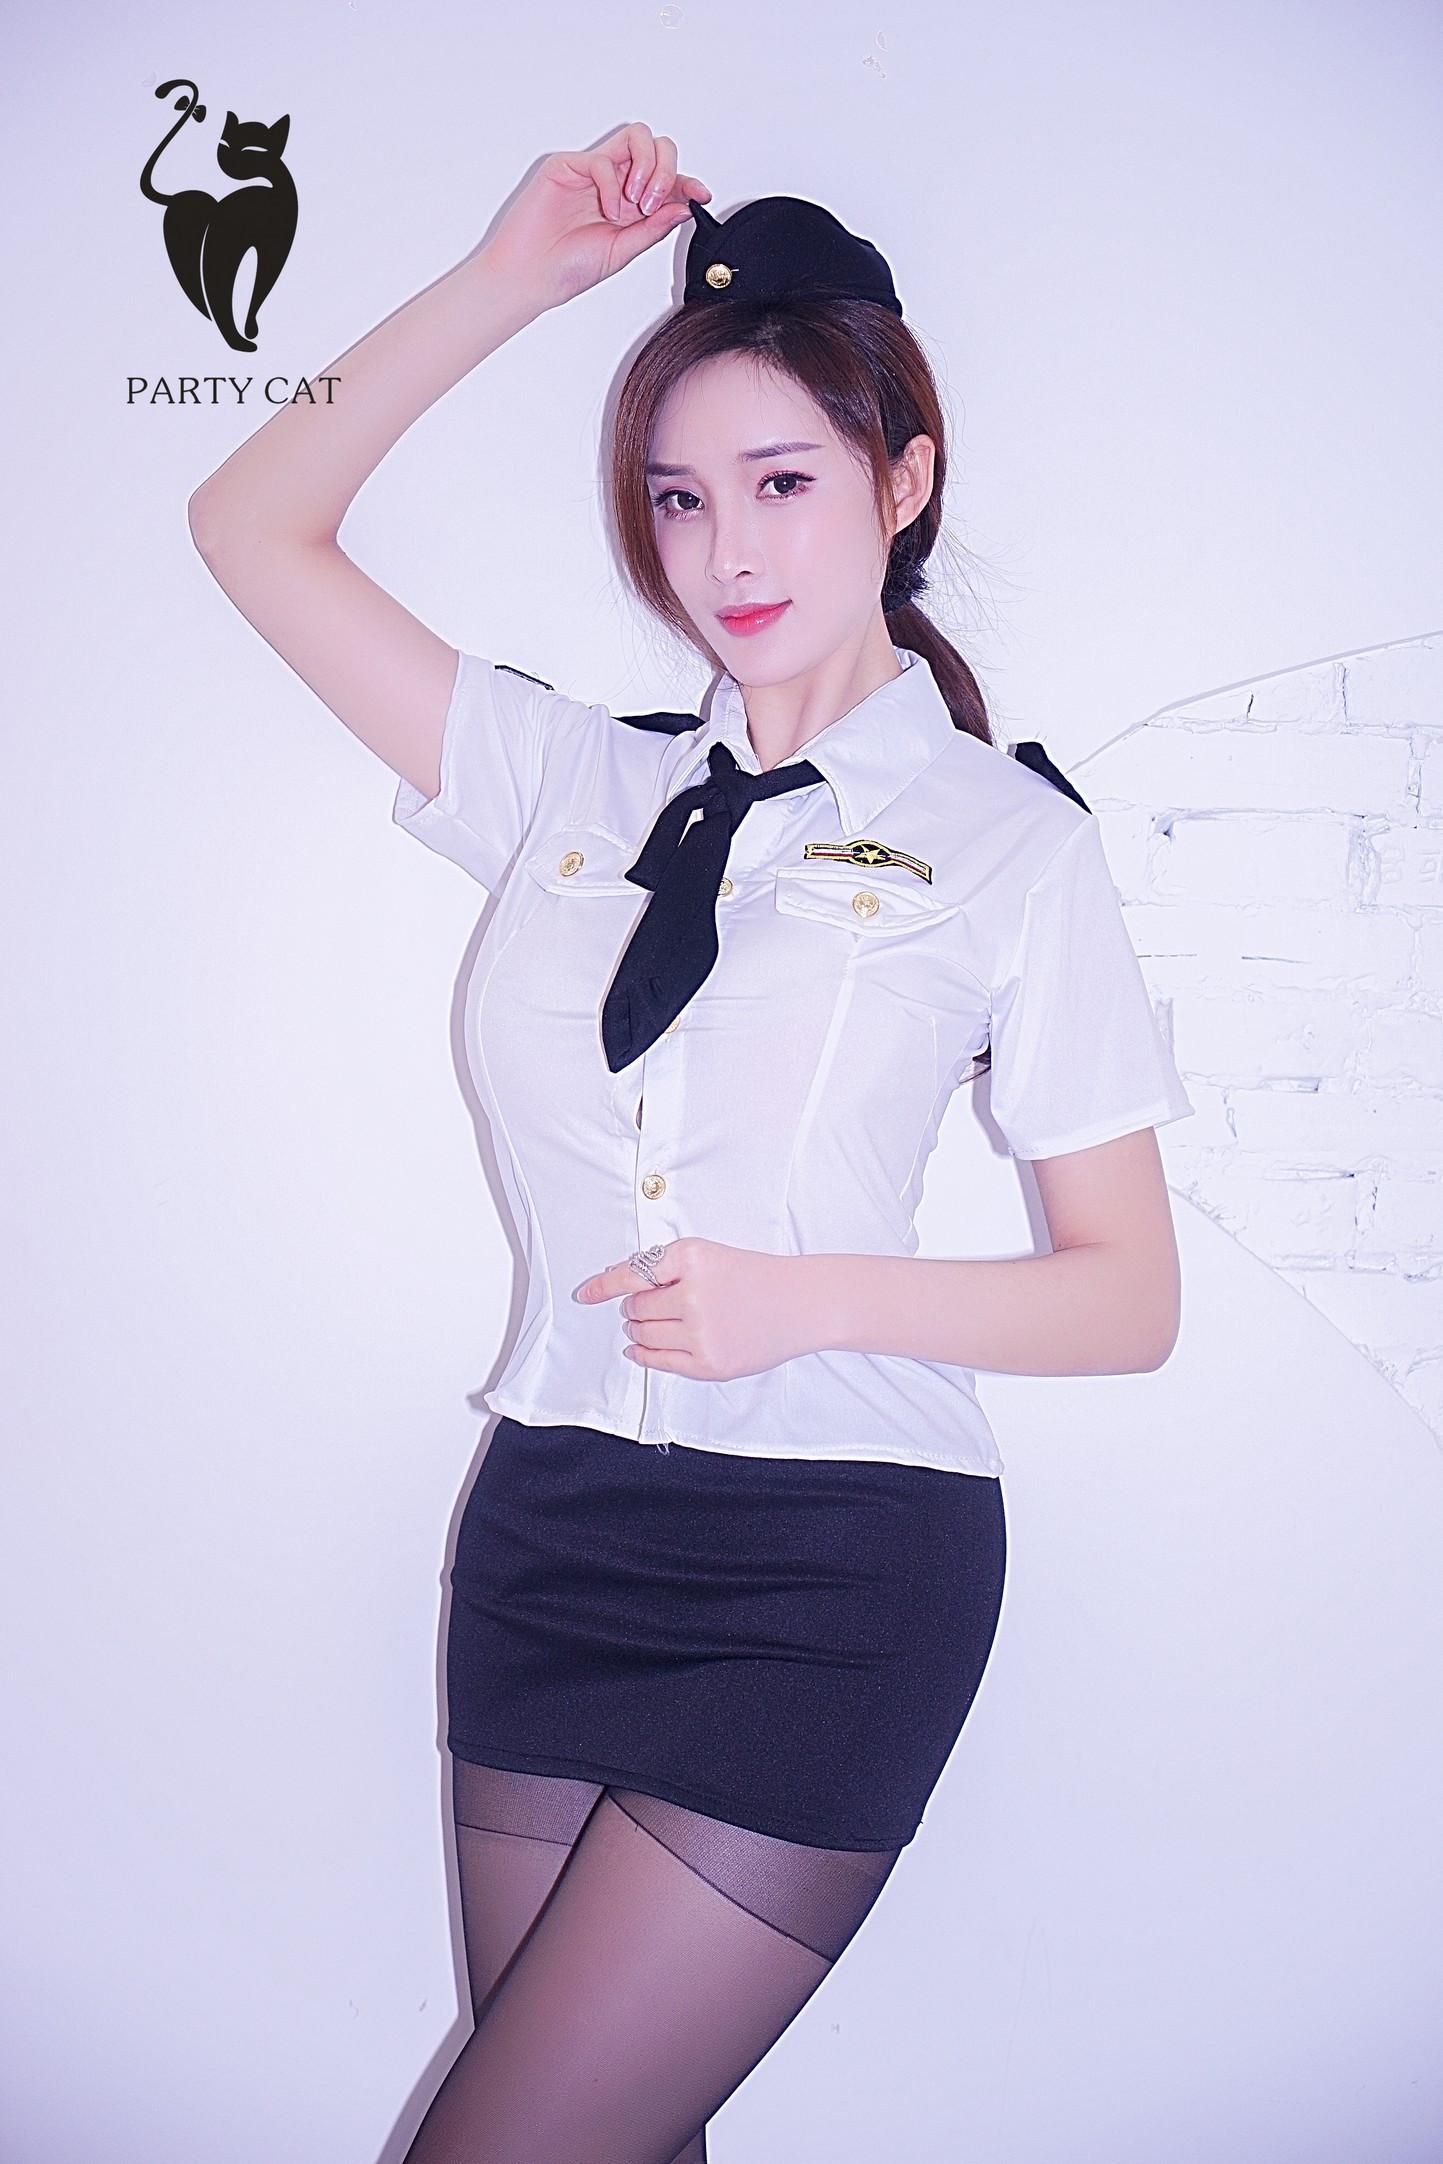 partycat023